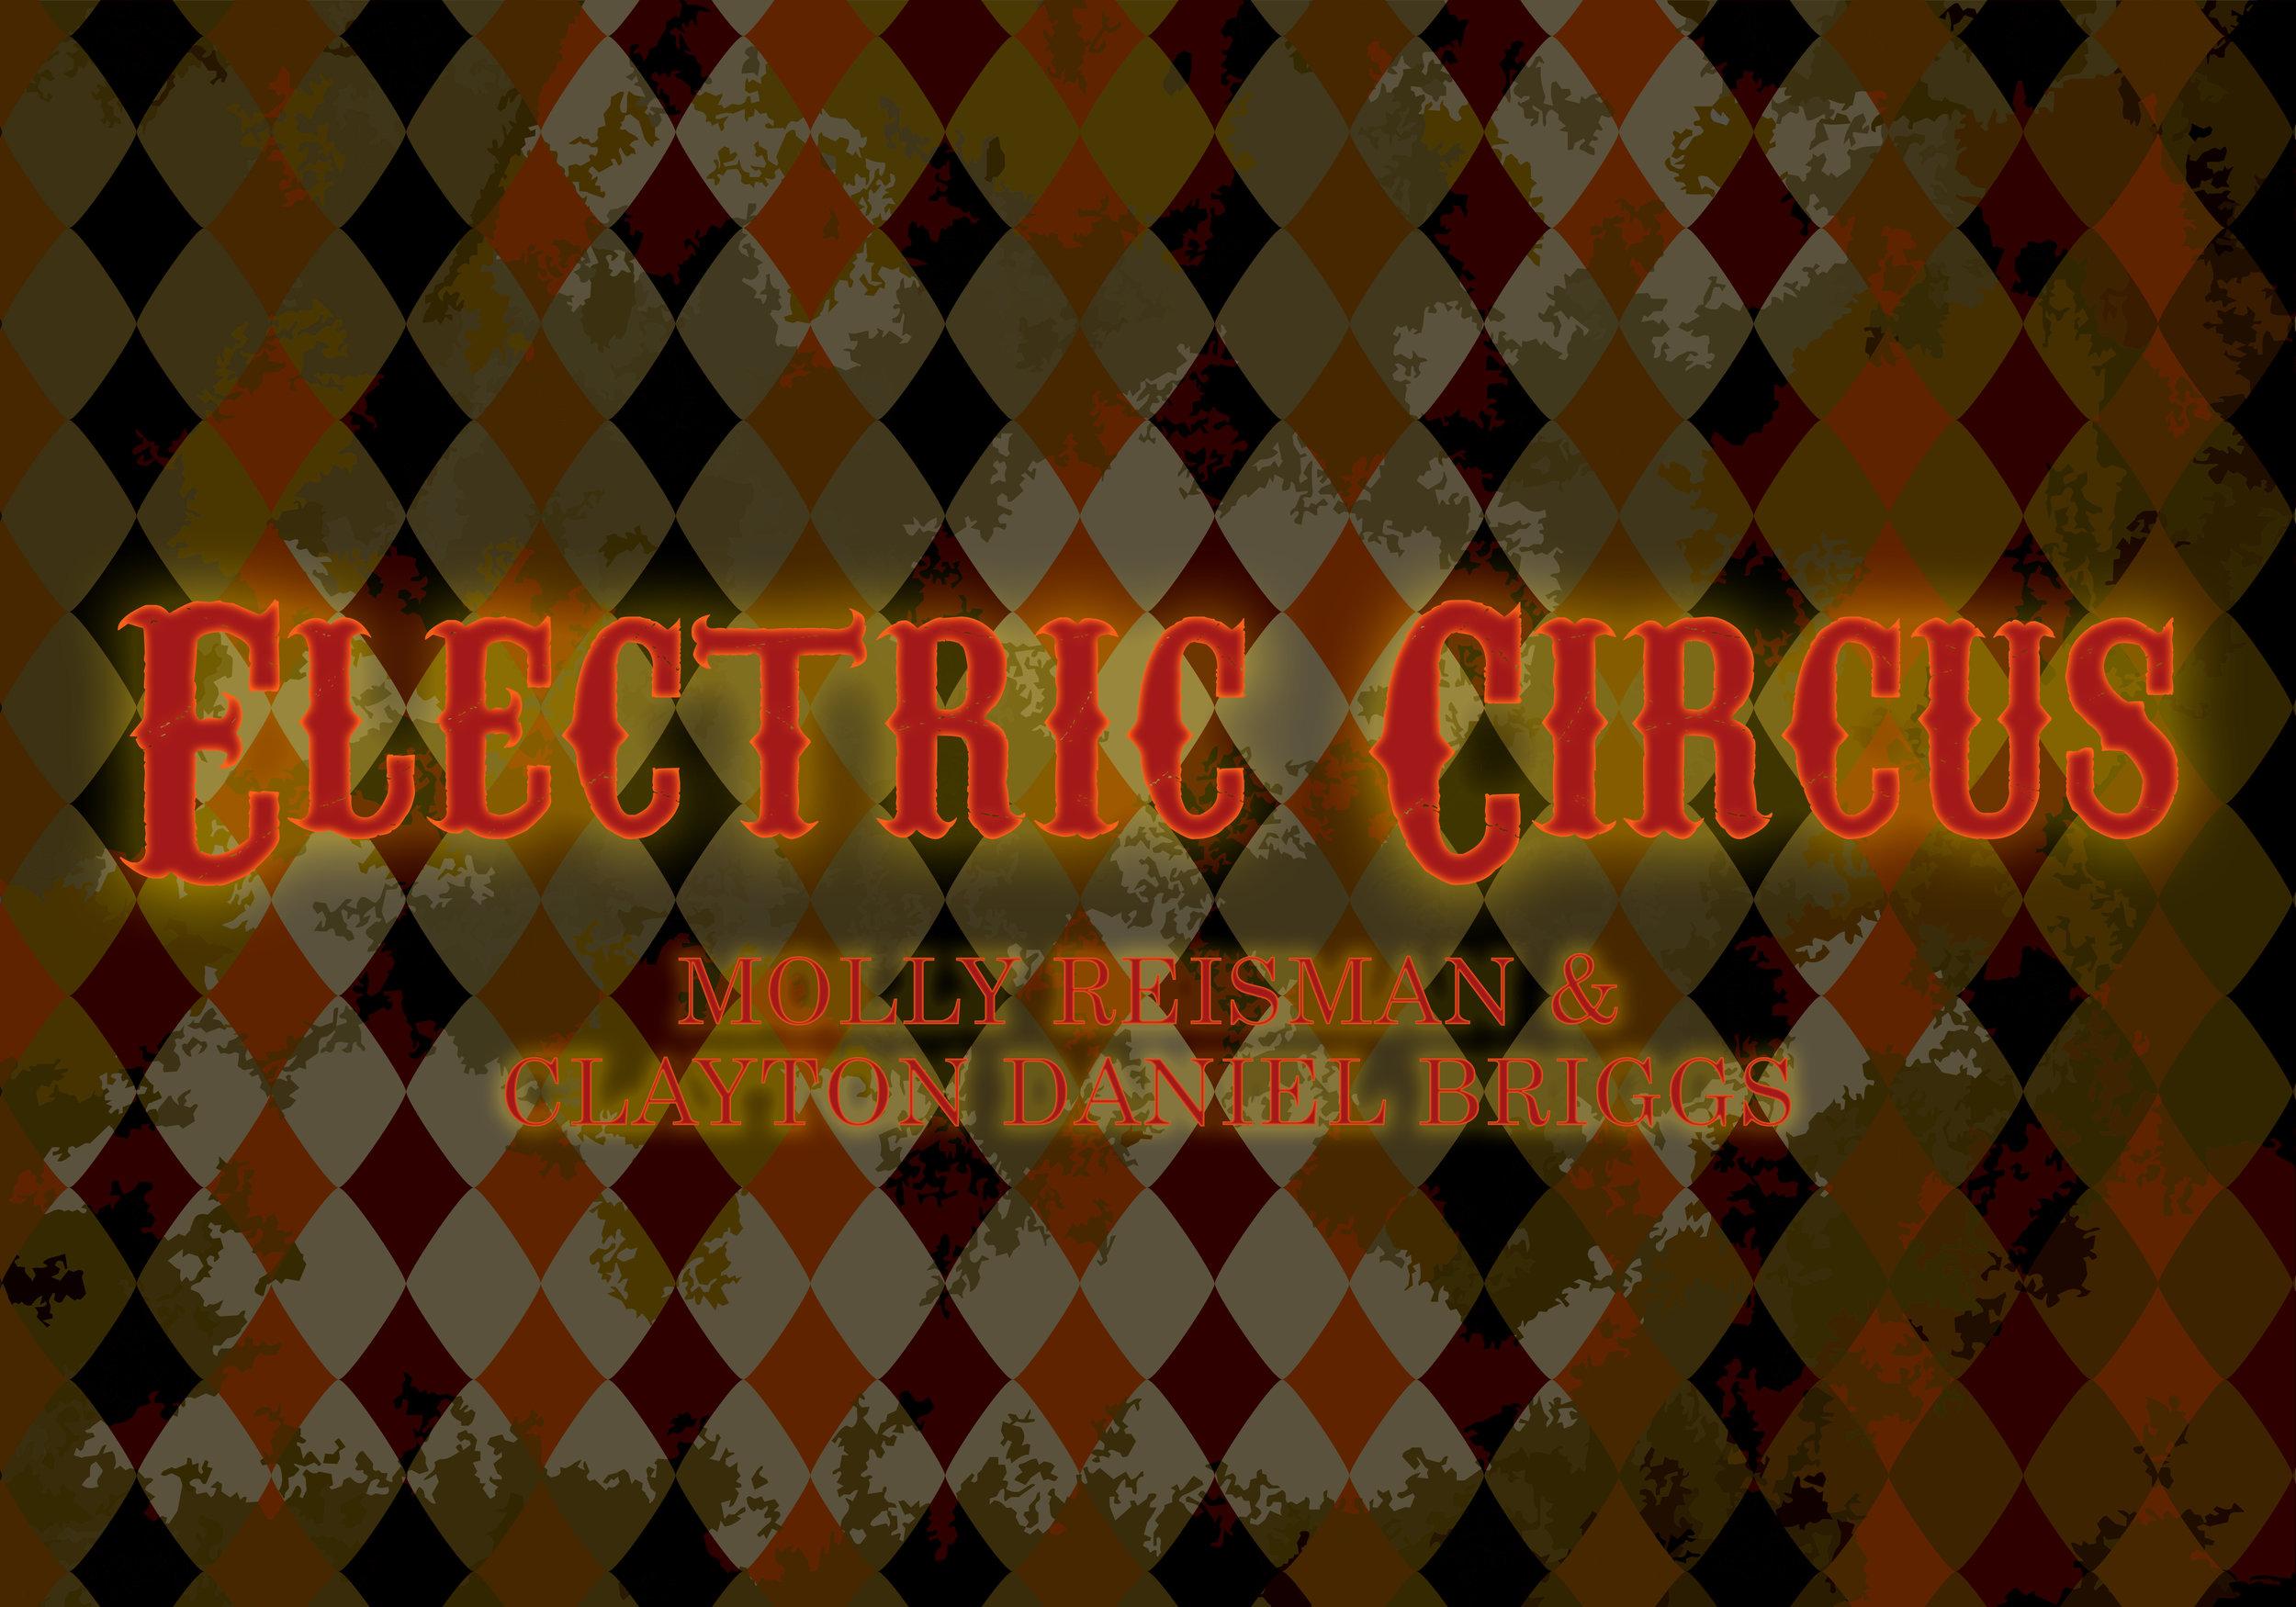 Electric Circus Poster.jpg